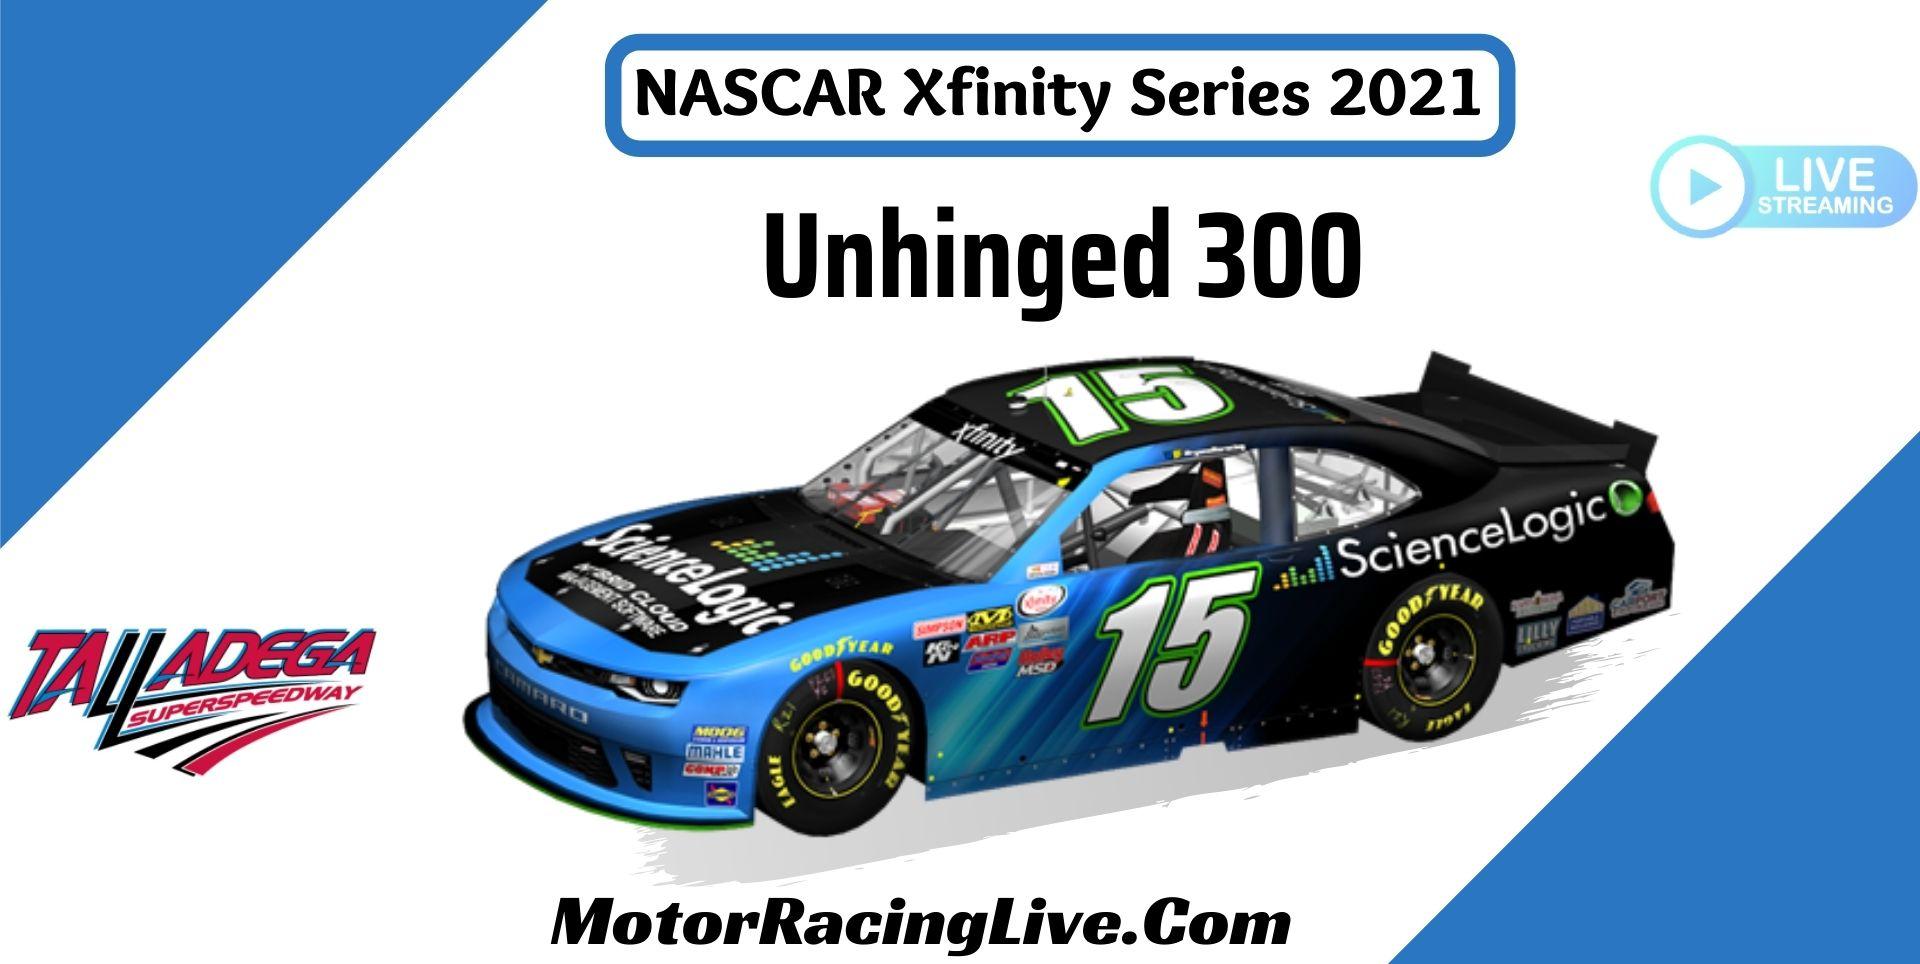 Unhinged 300 NASCAR Xfinity 2021 Live Stream